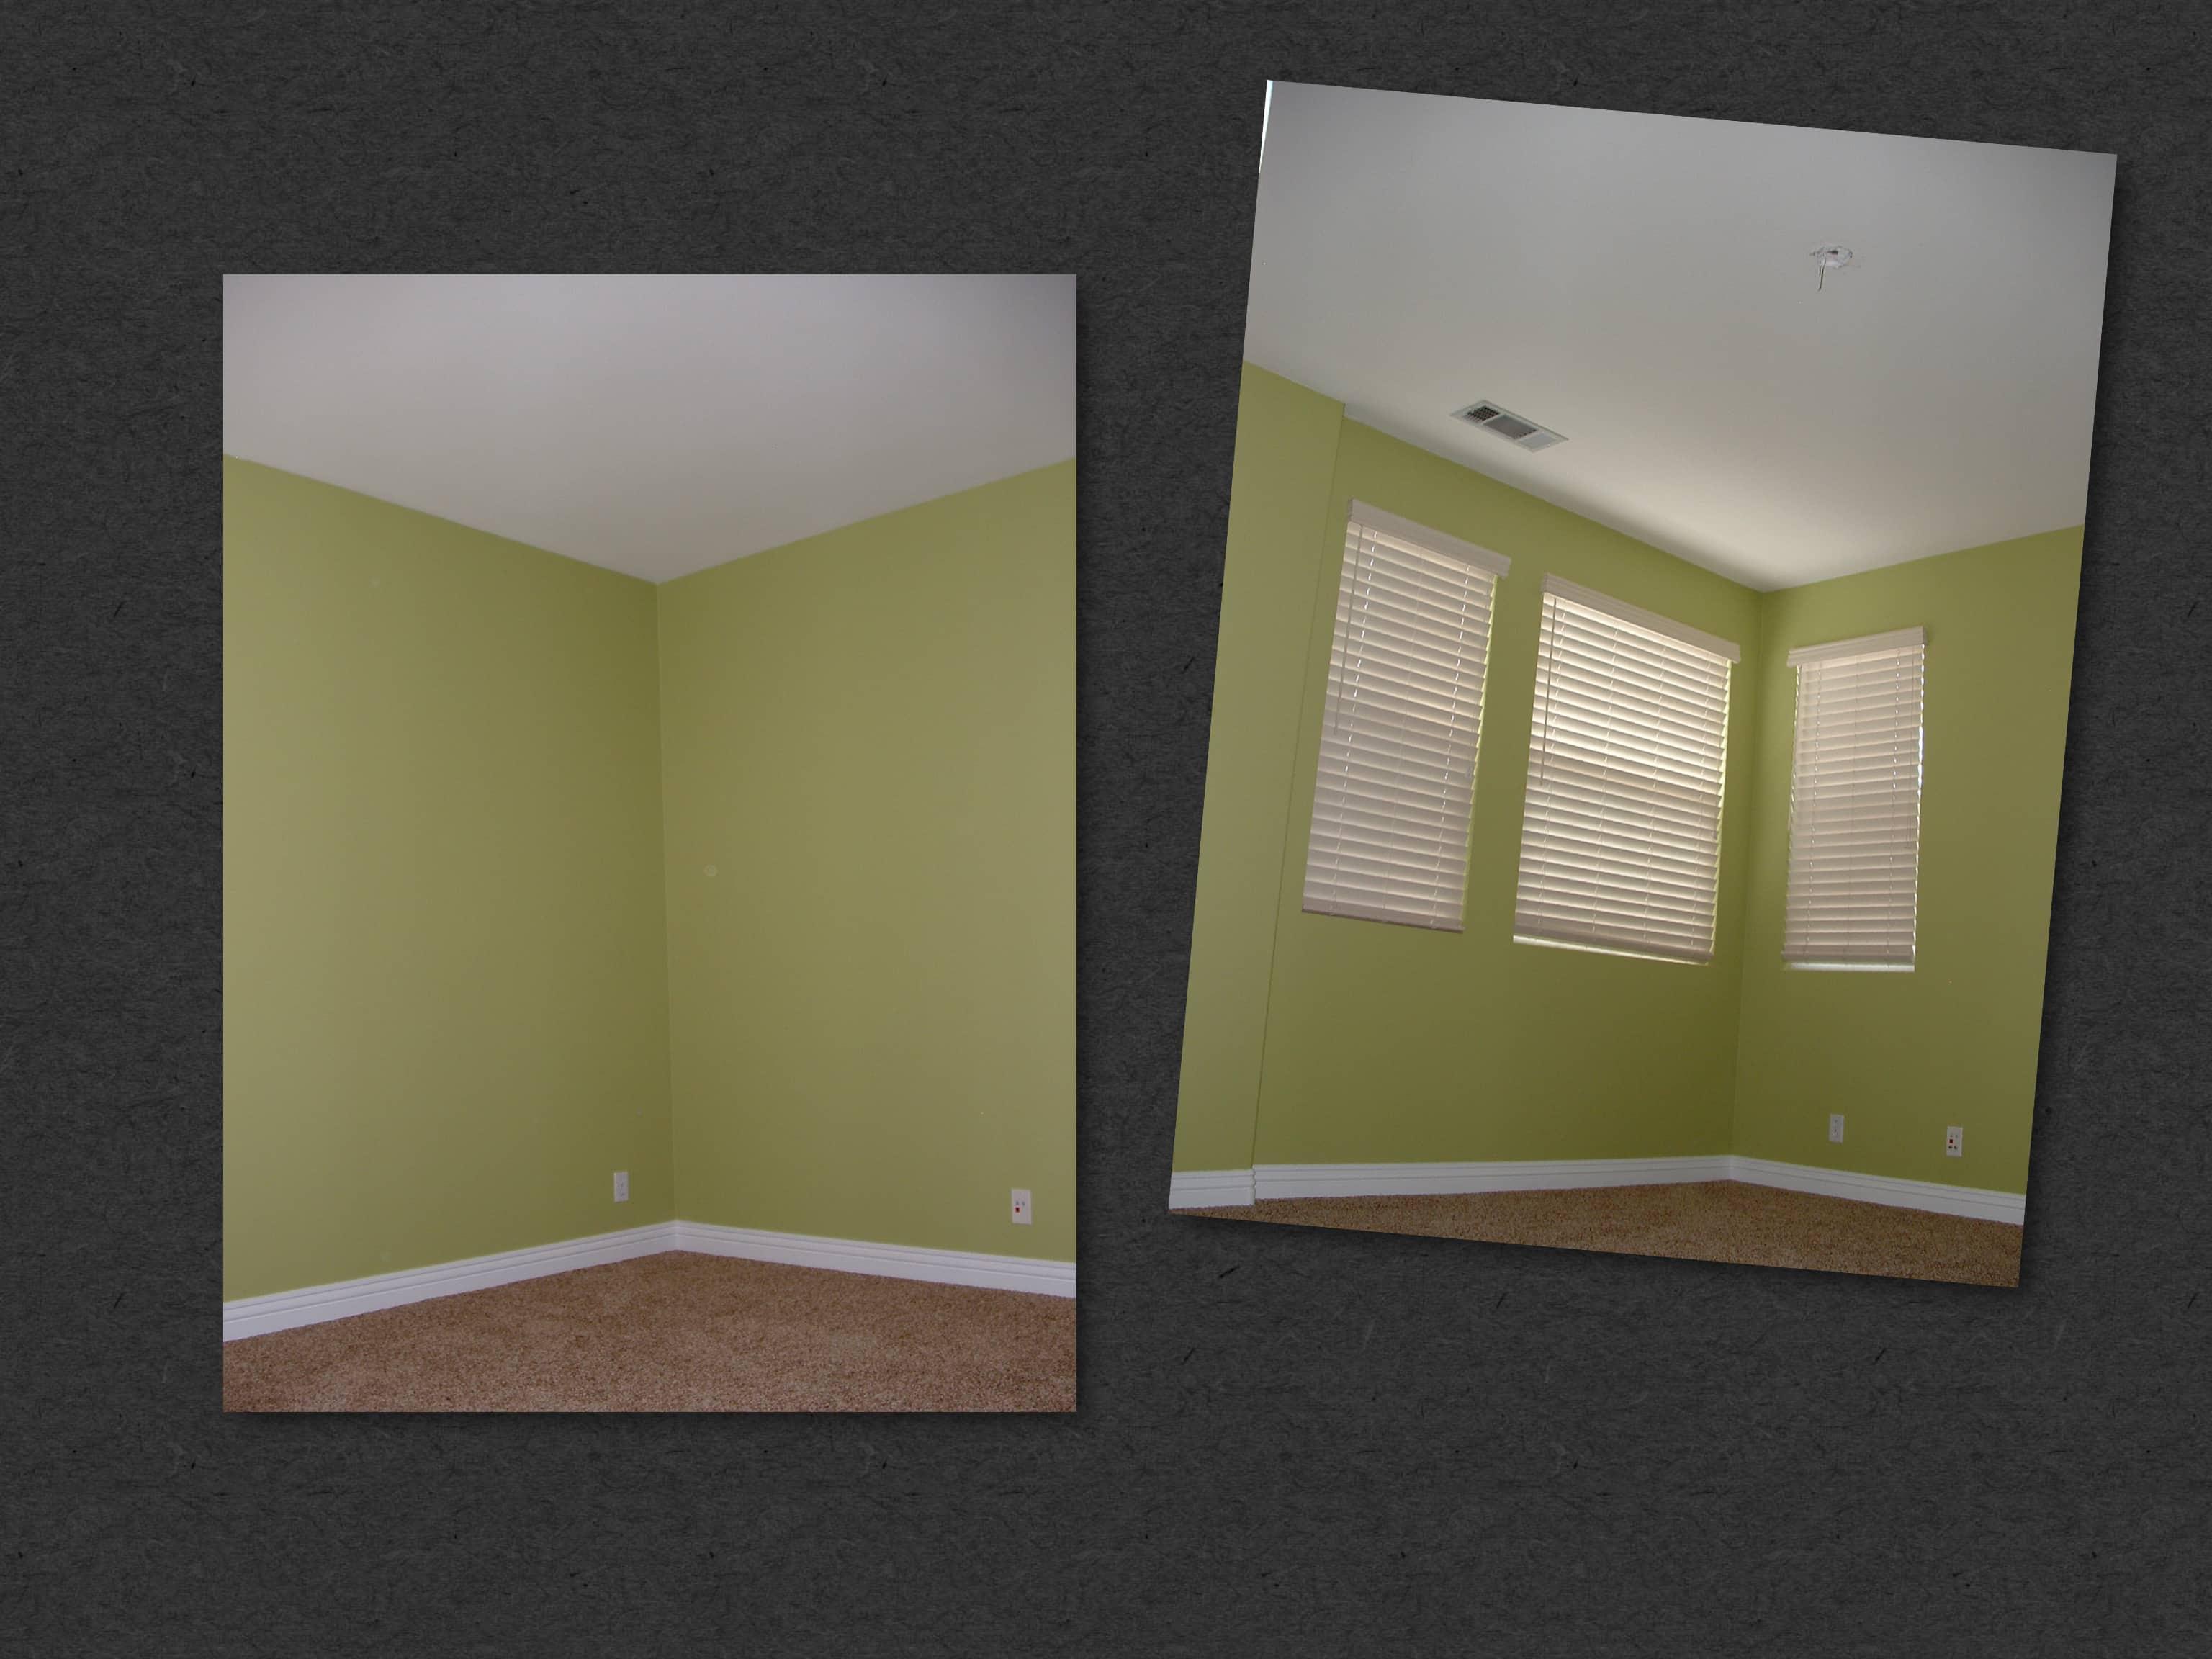 interior painting exterior painting danbury painting 203 600 6395 interior painting danbury ct